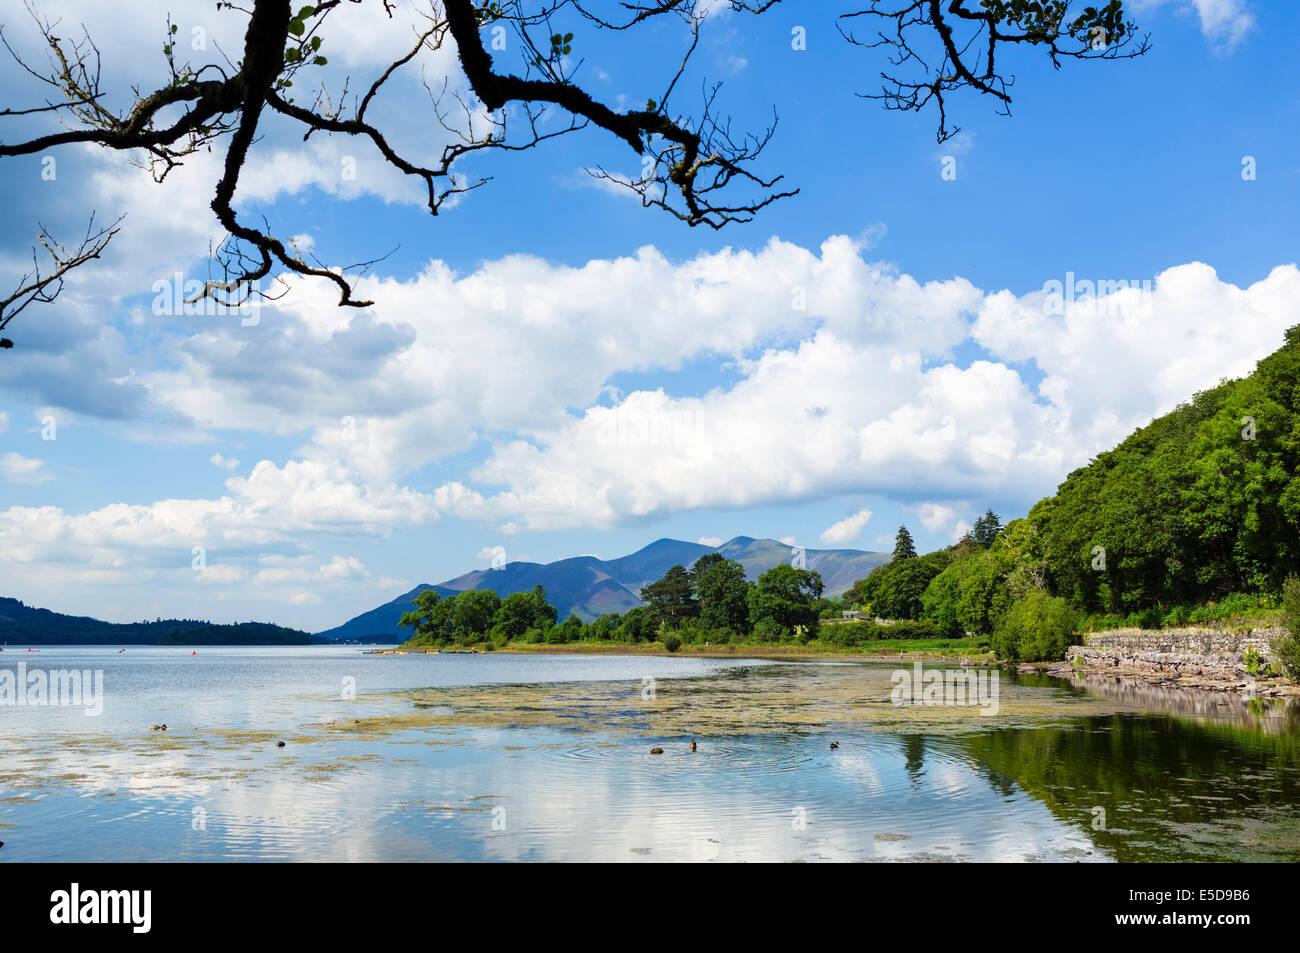 Skiddaw massif from Derwentwater, Borrowdale, Lake District, Cumbria, UK - Stock Image